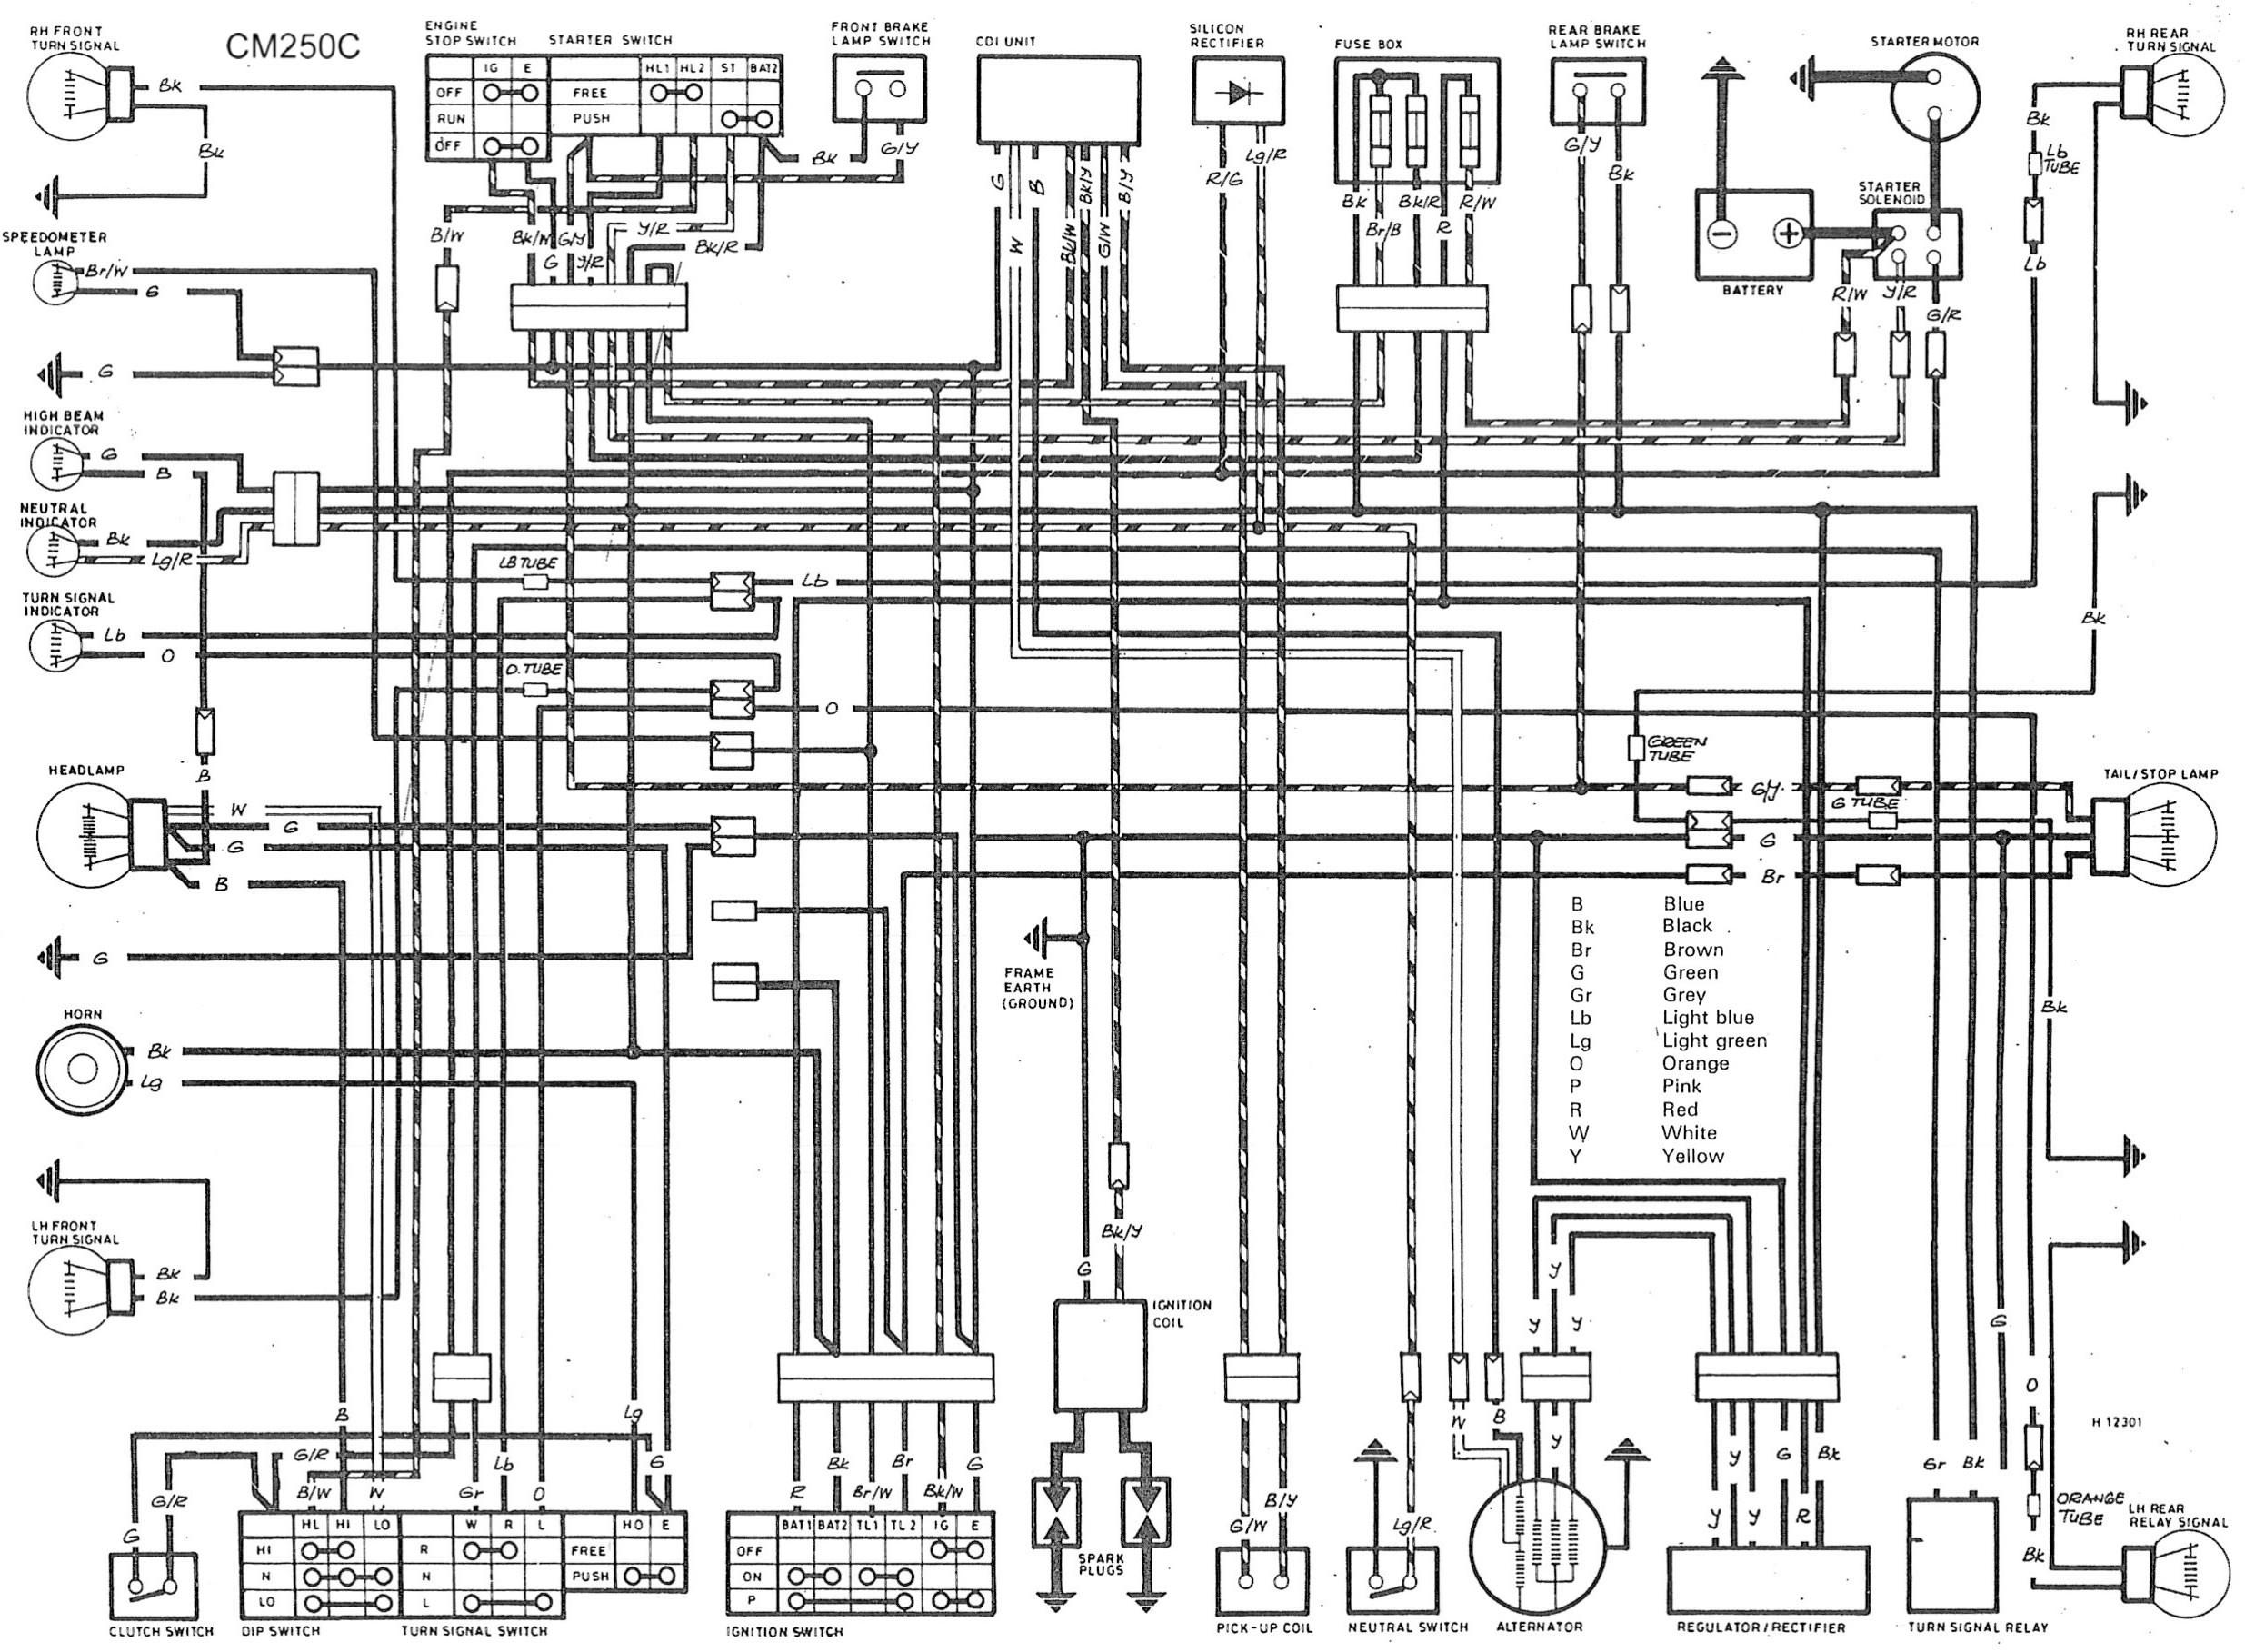 Motorcycle Transmission Diagram Honda Cm 250 Custom Motorcycle Cm250c Of Motorcycle Transmission Diagram